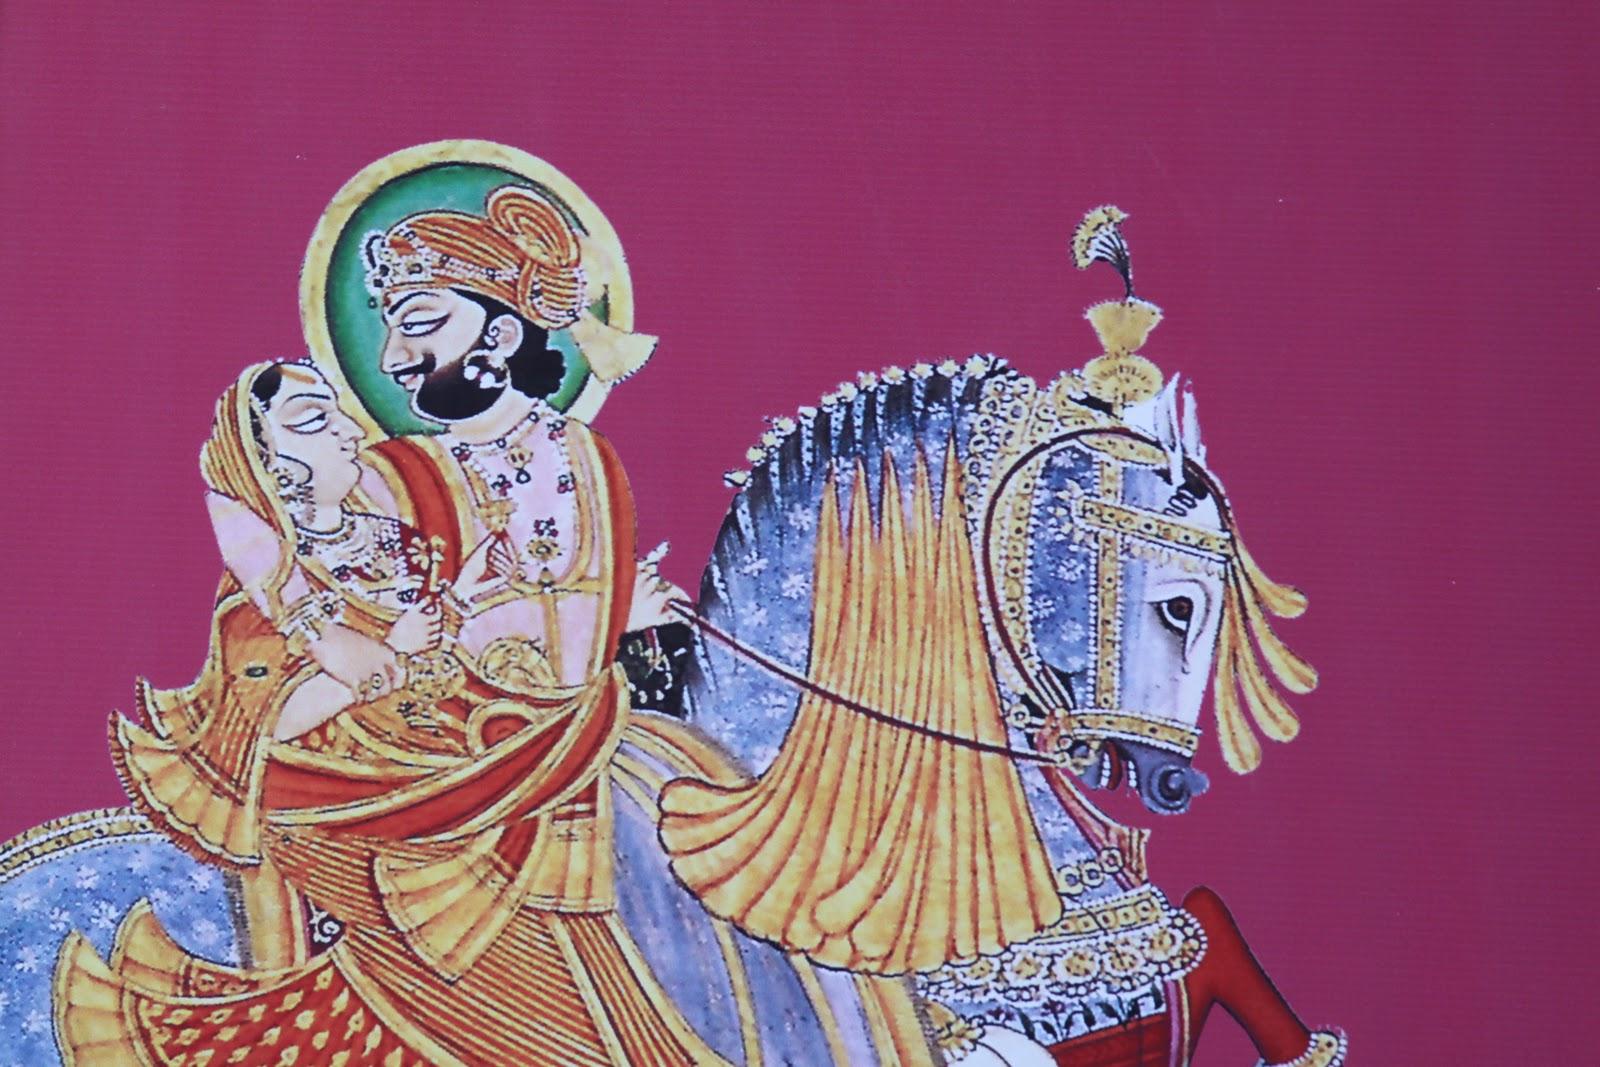 http://4.bp.blogspot.com/-pIUe_YBPiMg/TWW4L05BPJI/AAAAAAAAAi8/3FNuVEt7904/s1600/art+and+romance+of+india.JPG